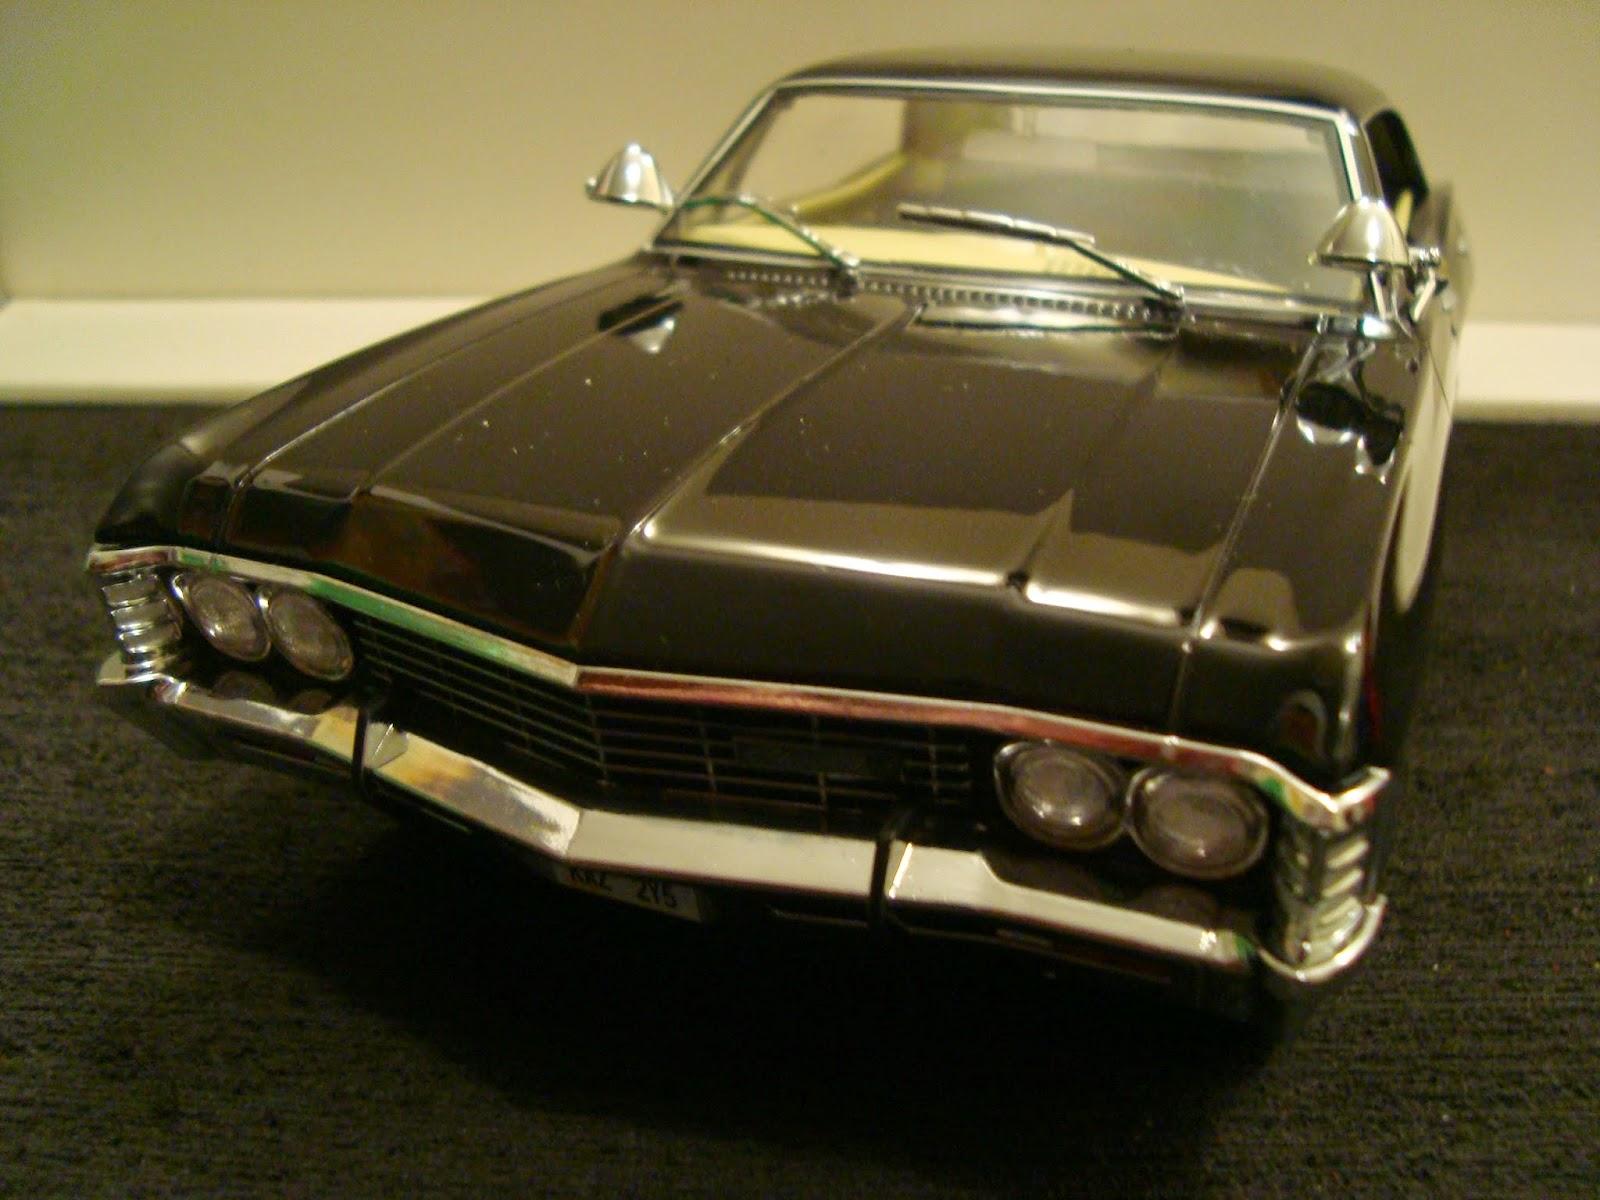 hight resolution of 1967 chevrolet impala ss